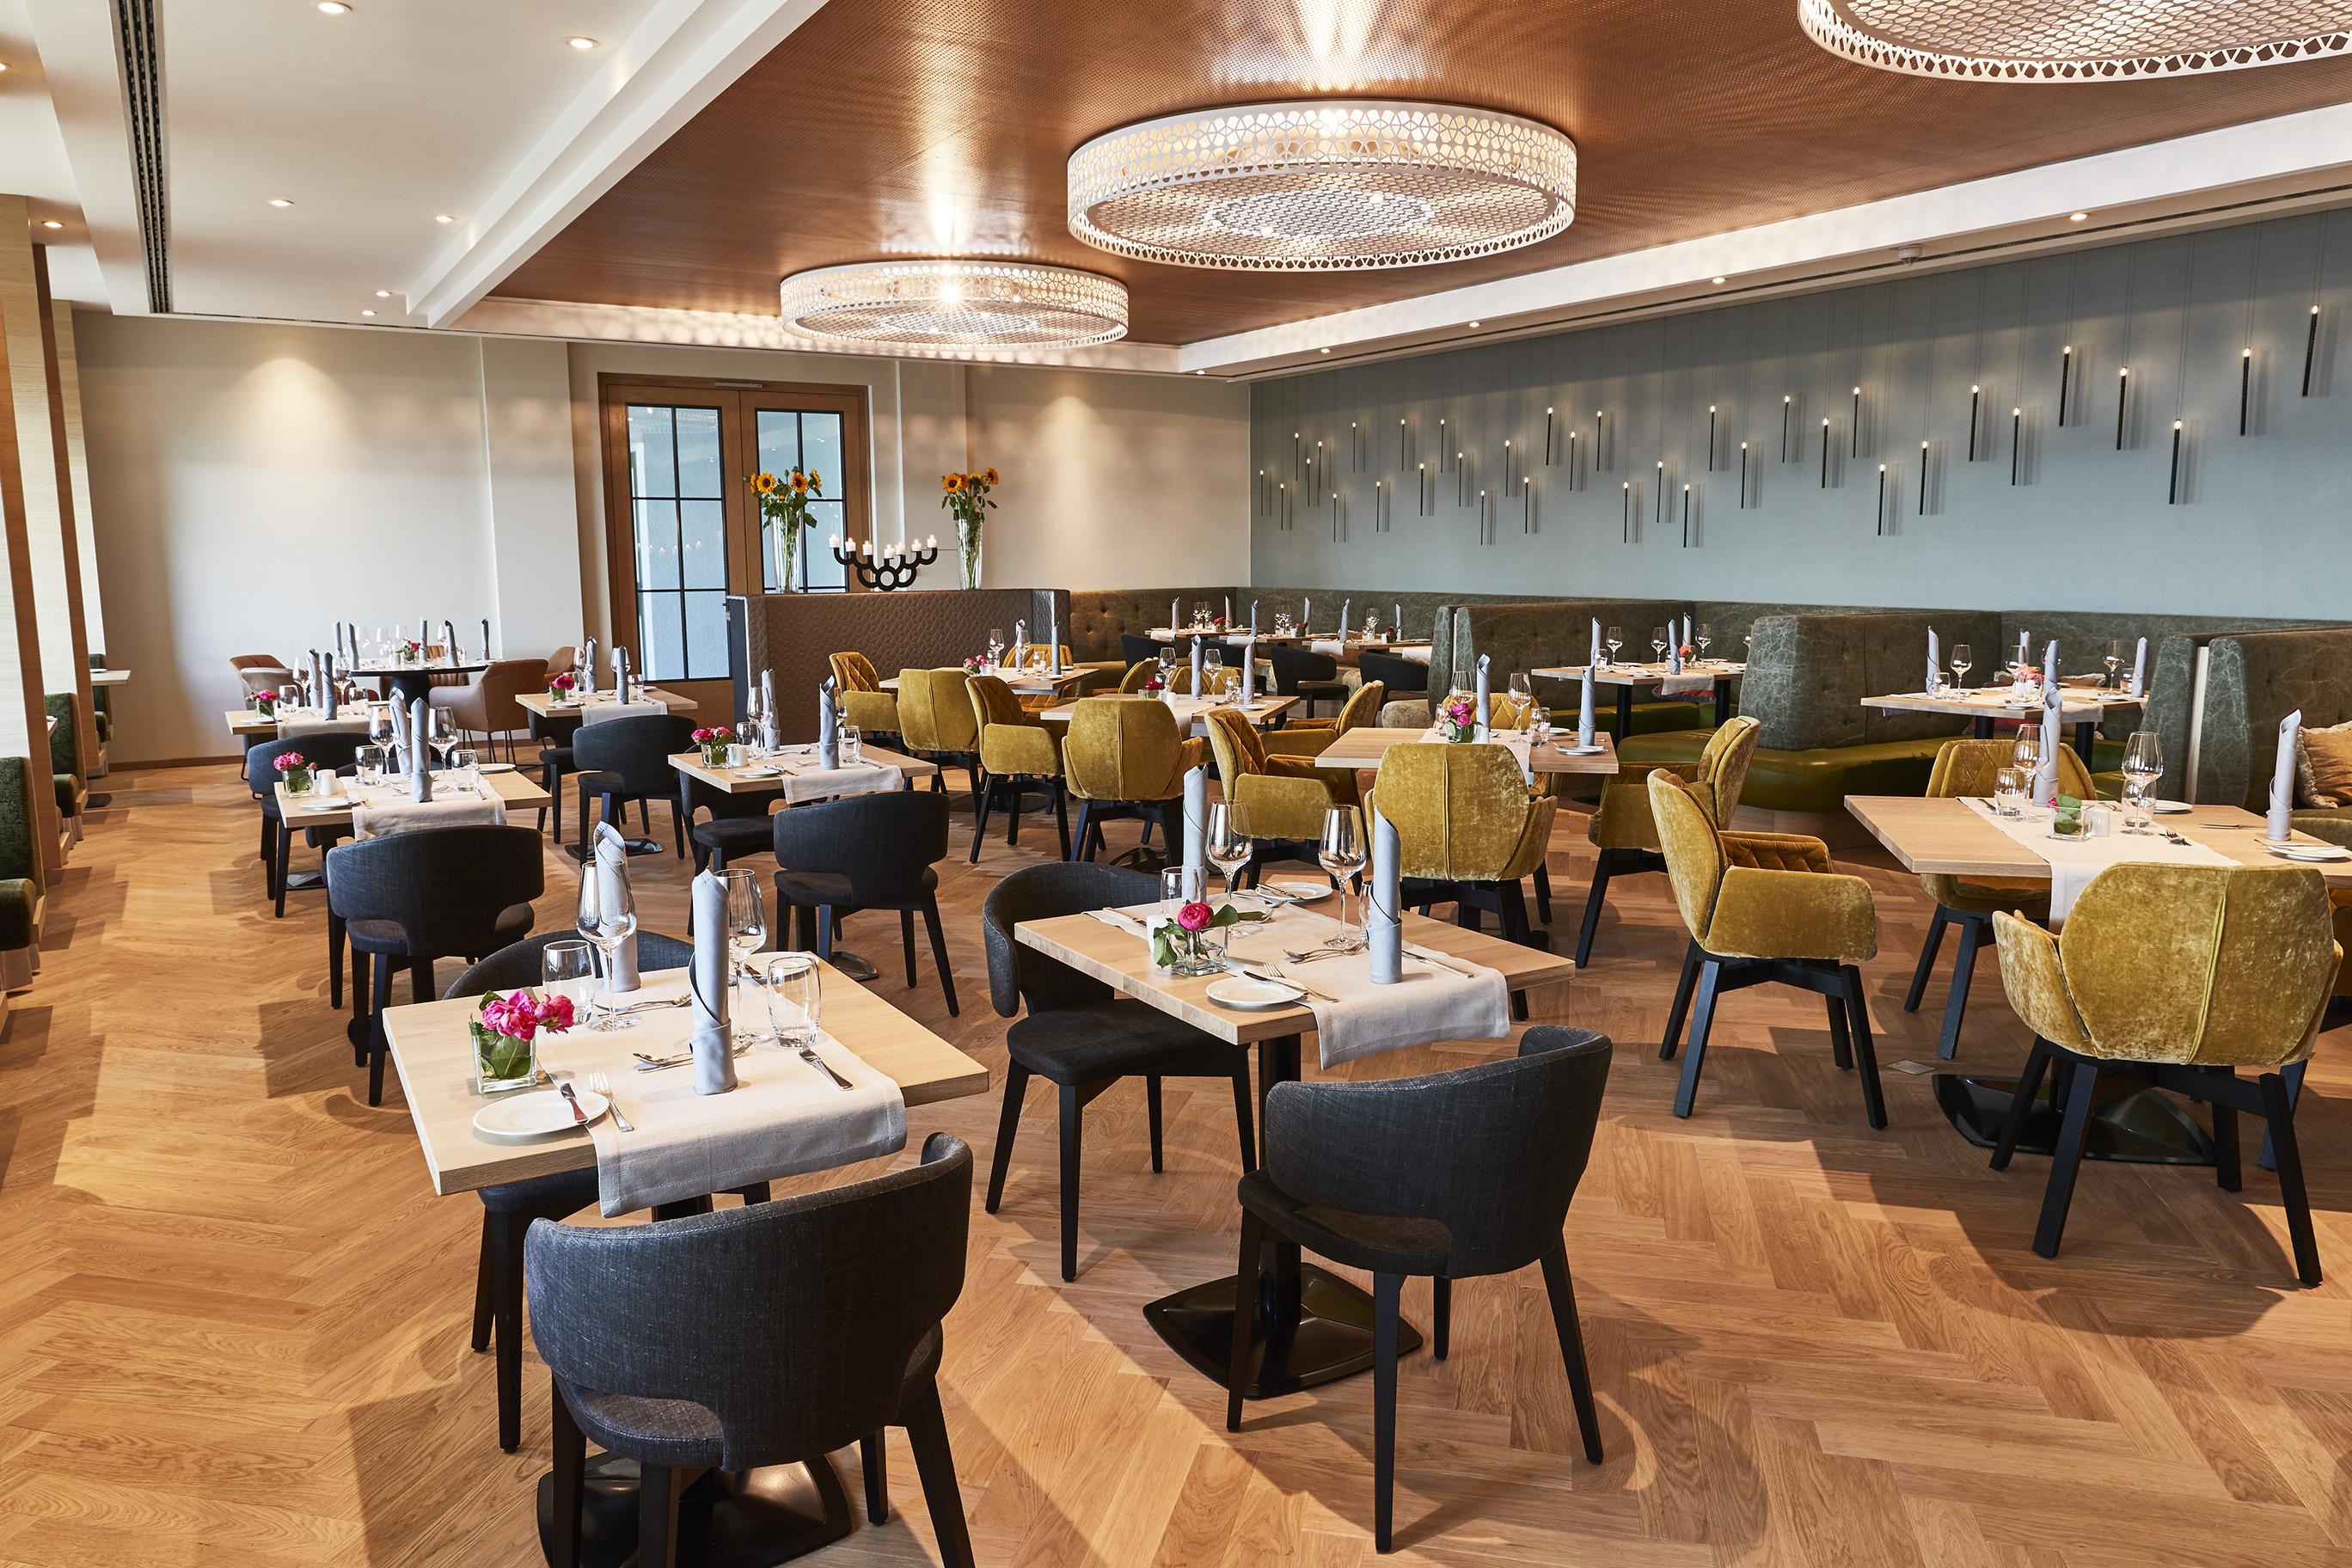 Speisekarte – Steigenberger Inselhotel Seerestaurant in Konstanz ...